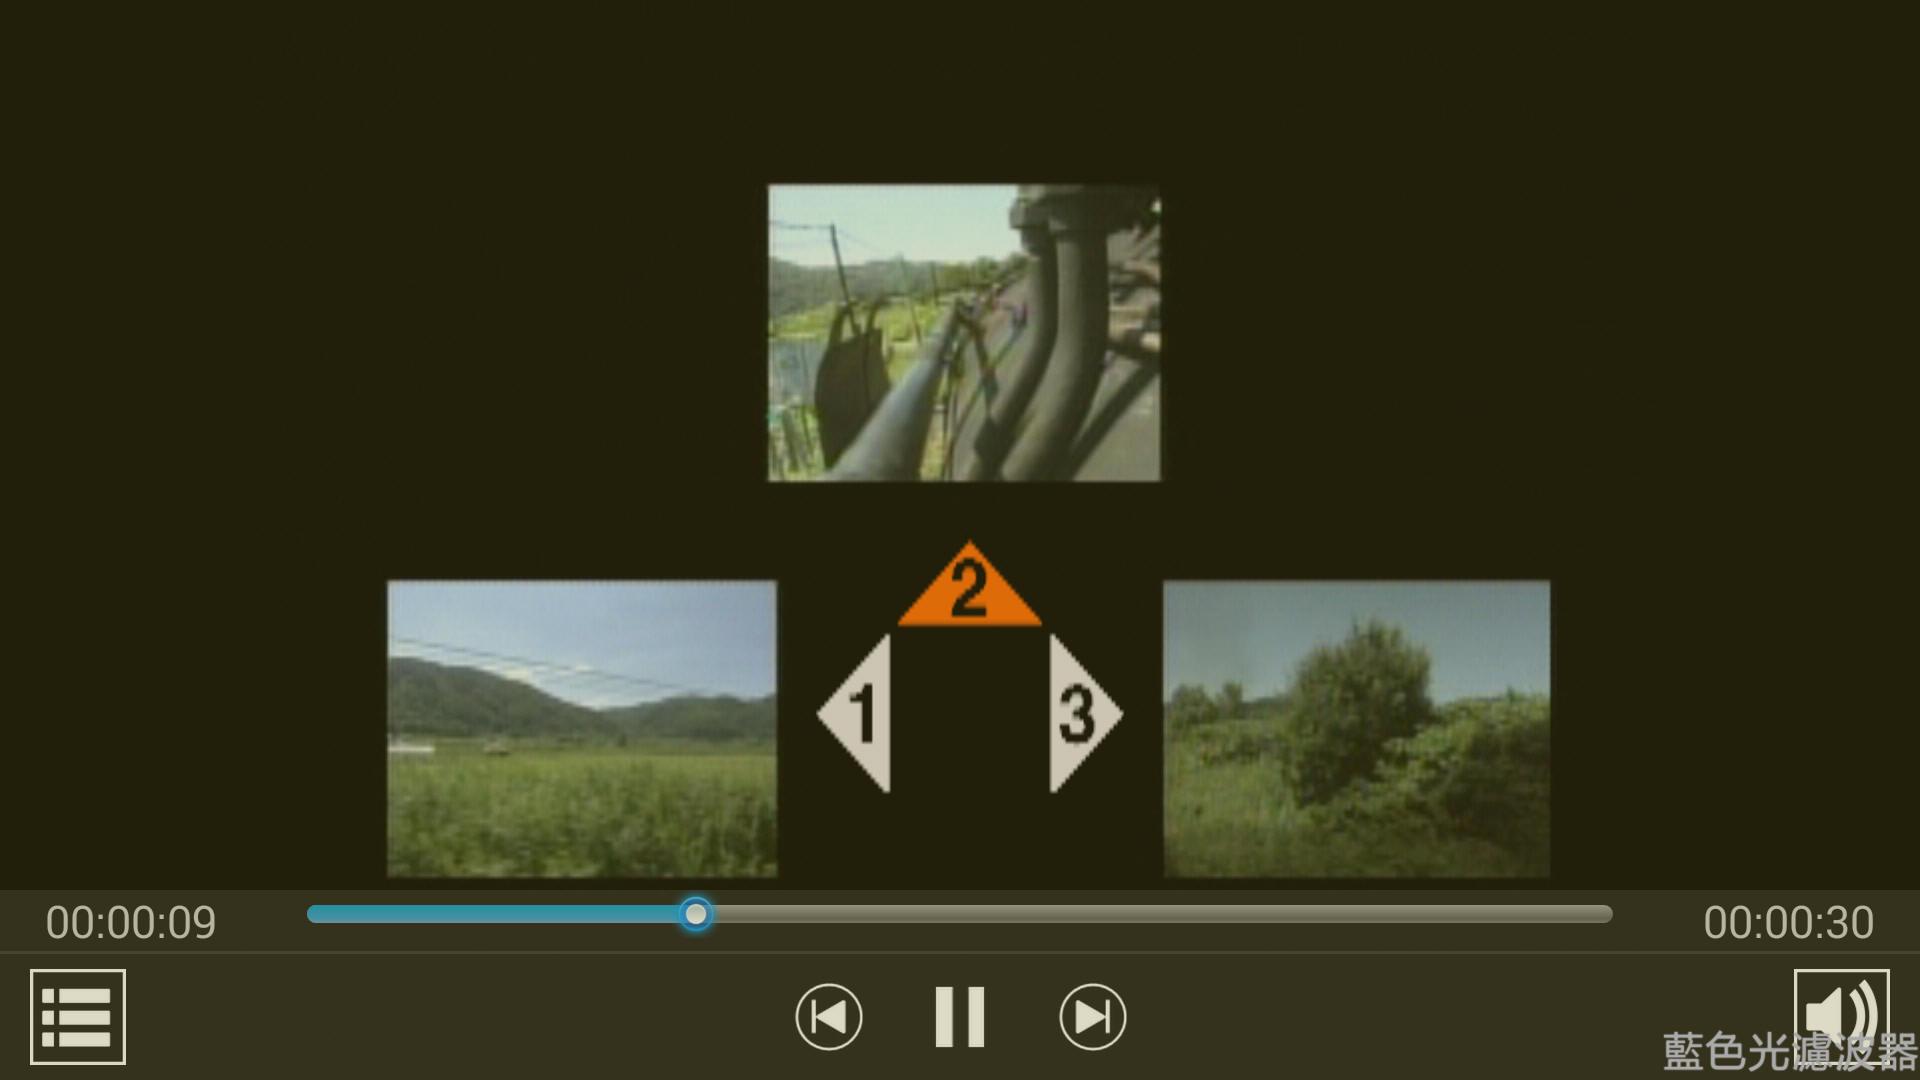 http://52.198.8.174/product/img/TrueDVD-Streamer_Multi-angle.jpg